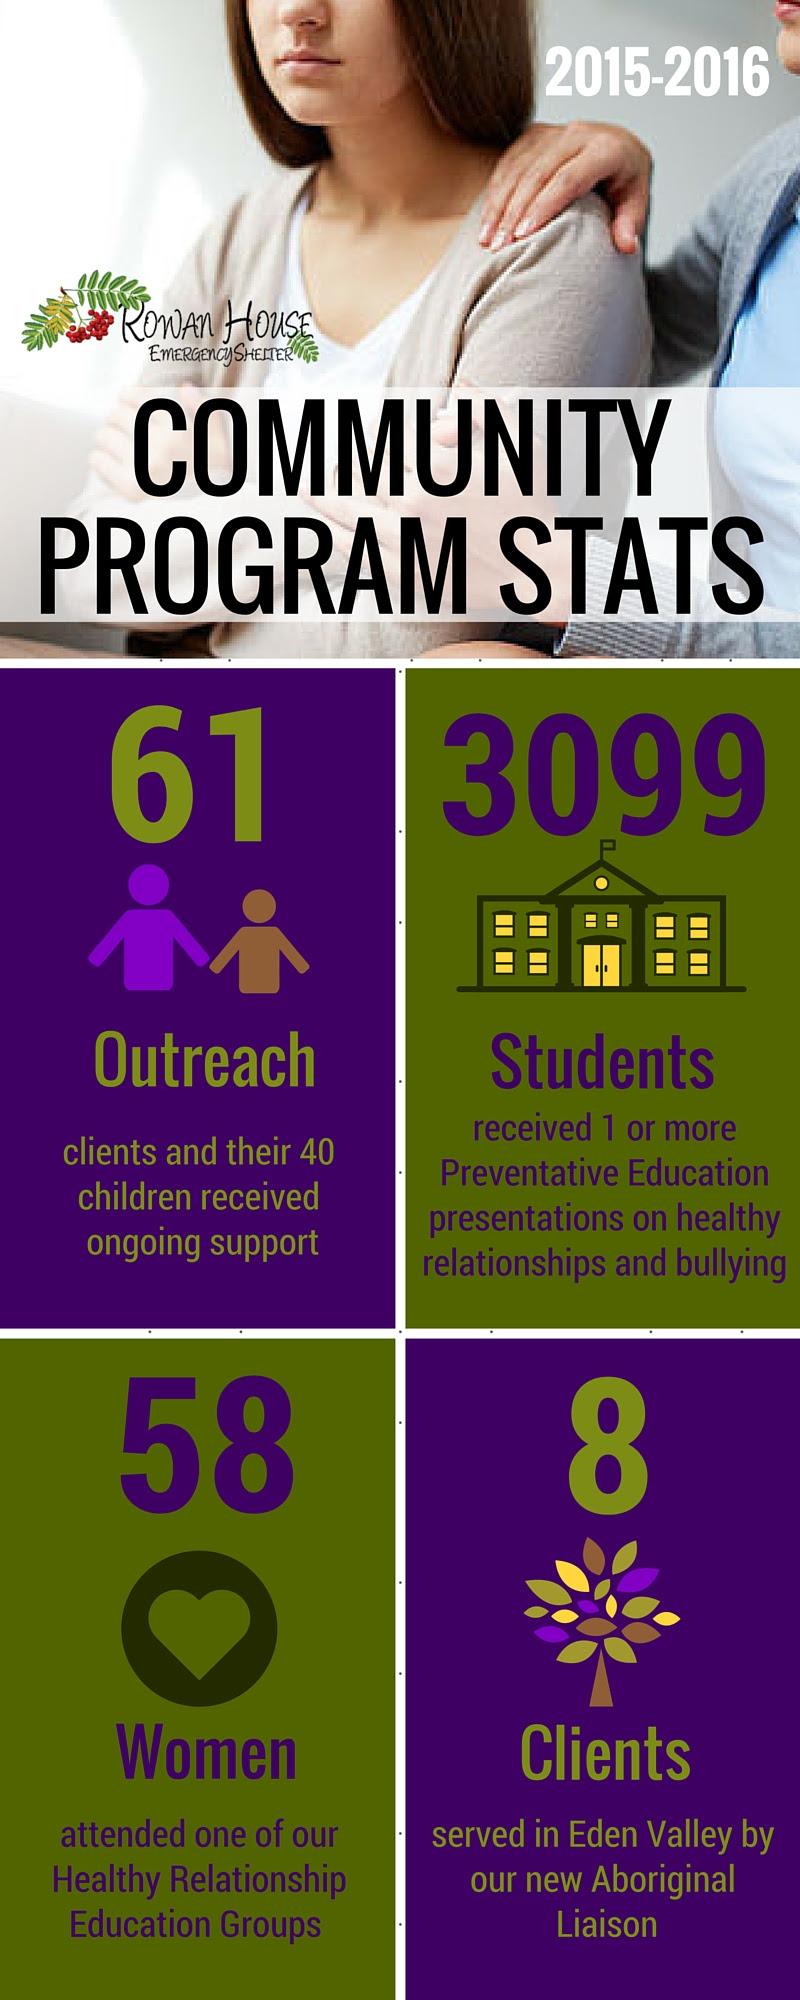 Community Program Stats 2015